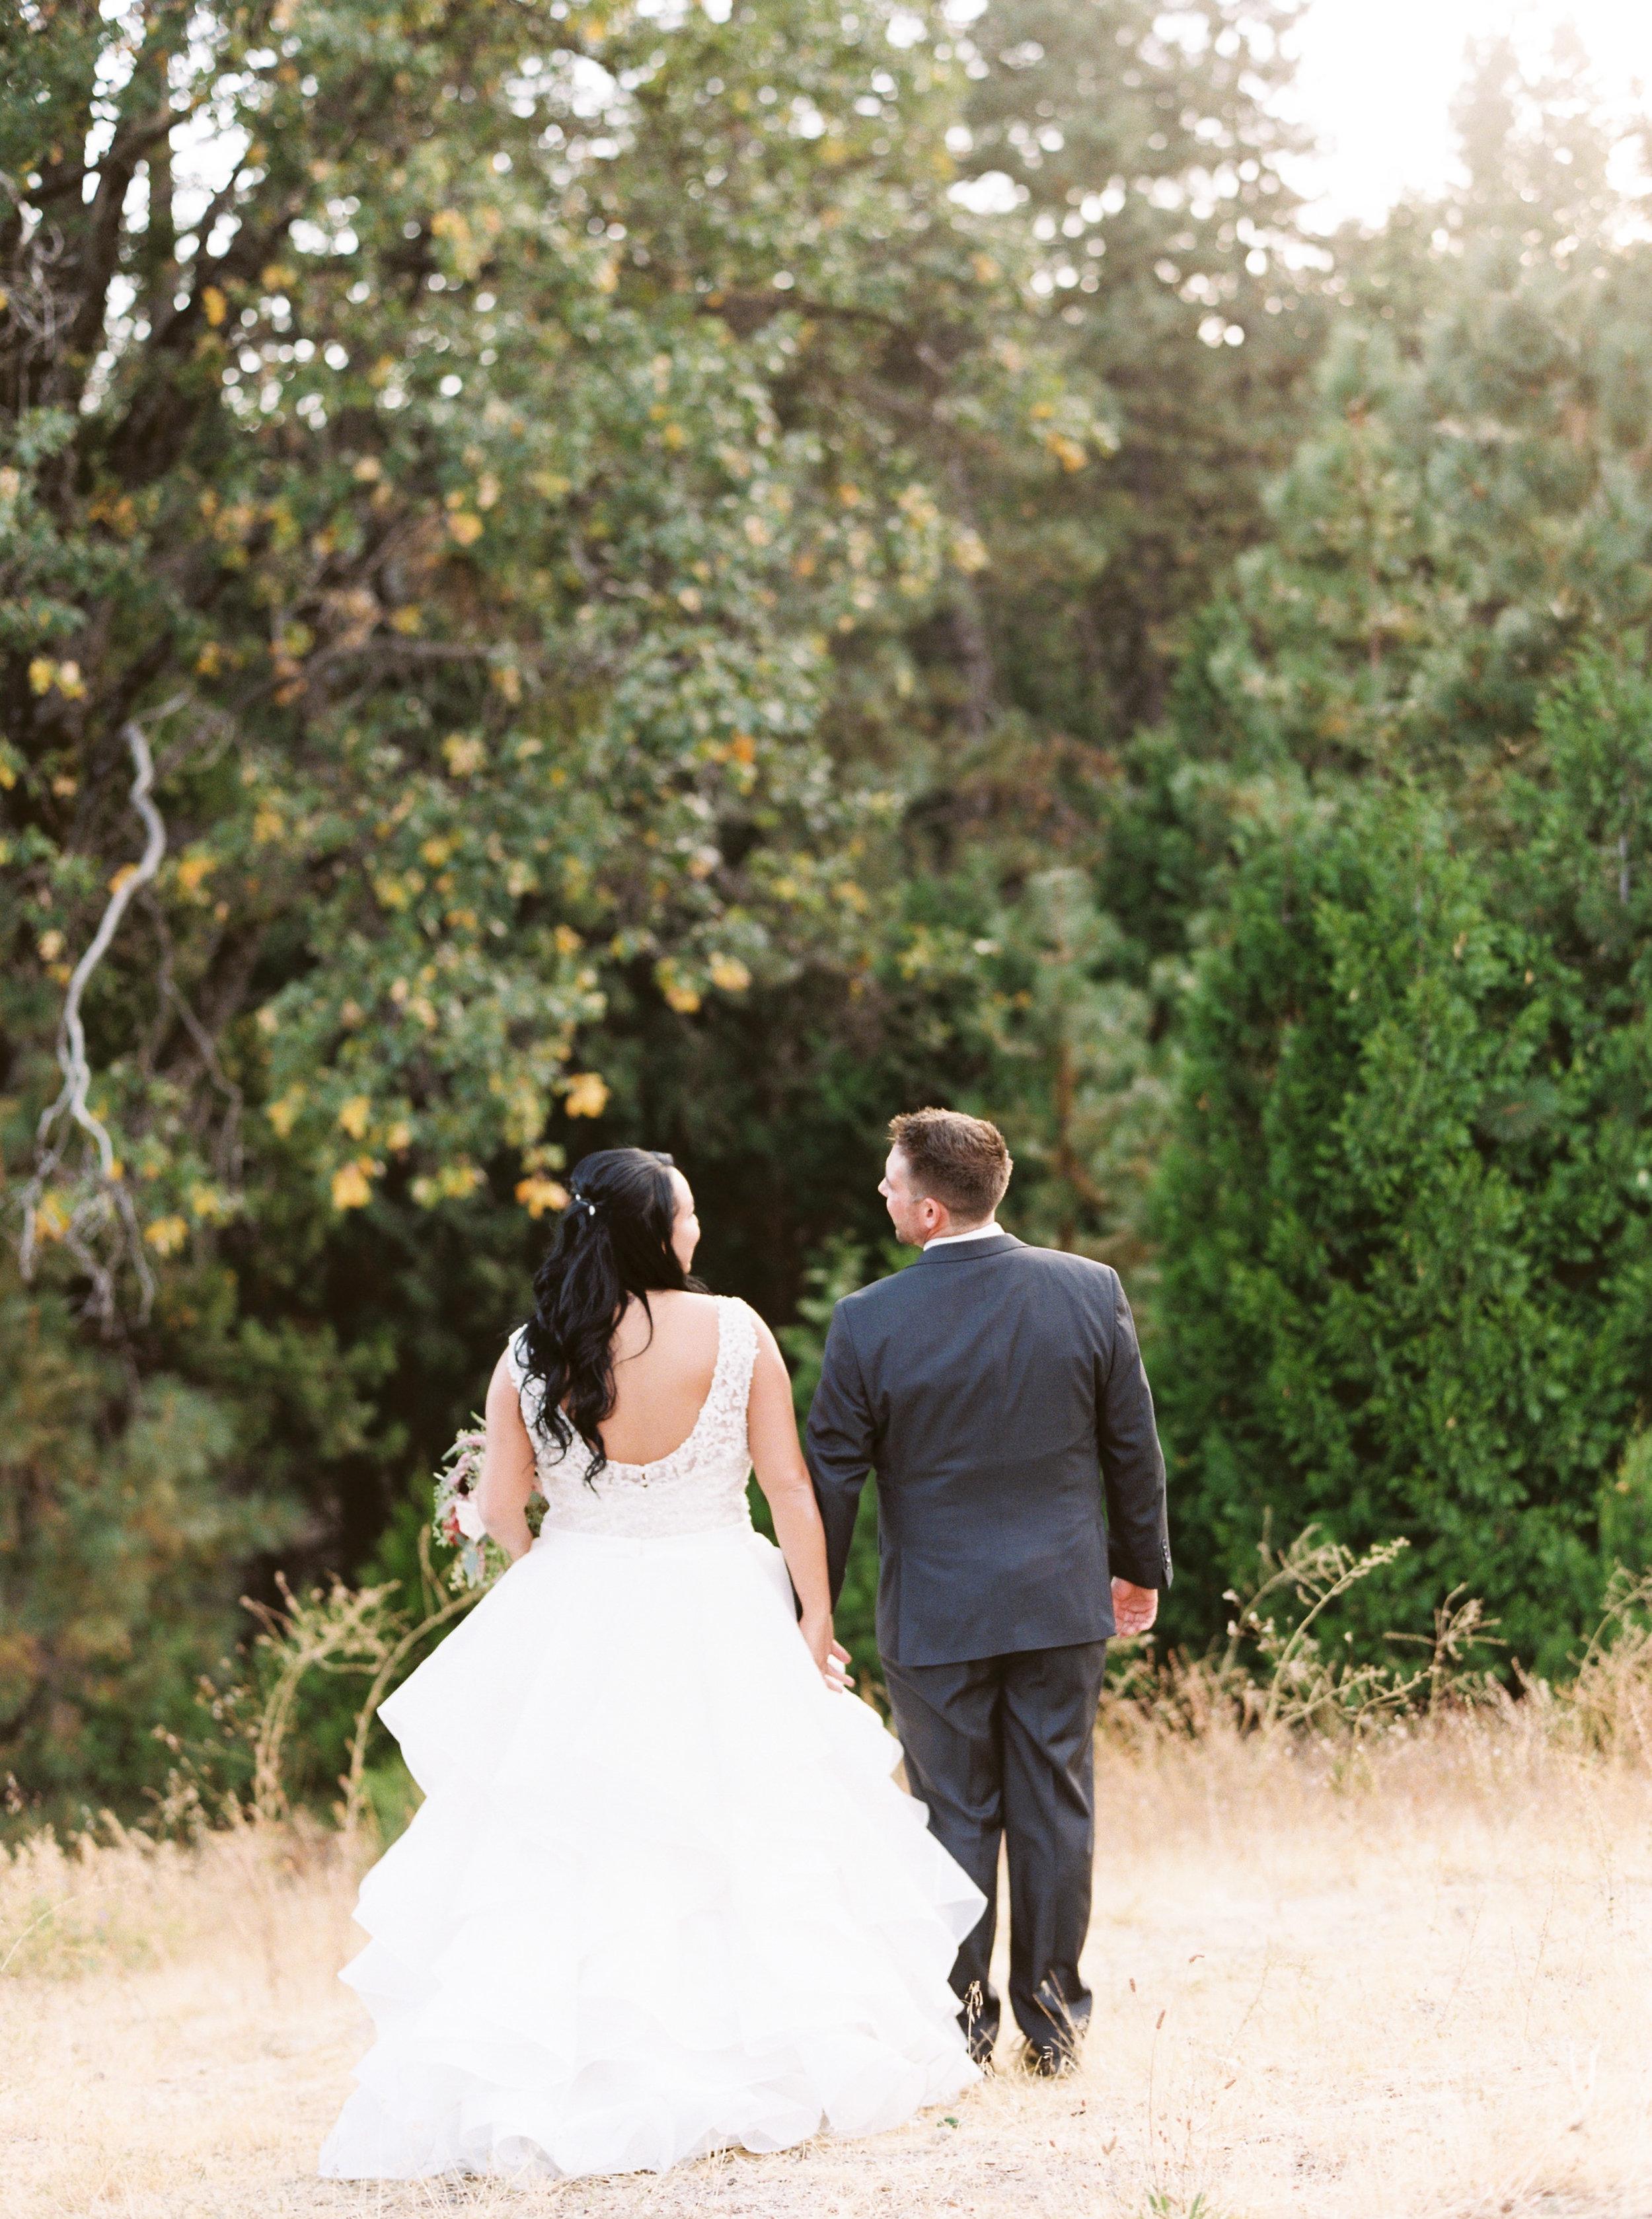 Tenaya-lodge-wedding-at-yosemite-national-park-california-13.jpg